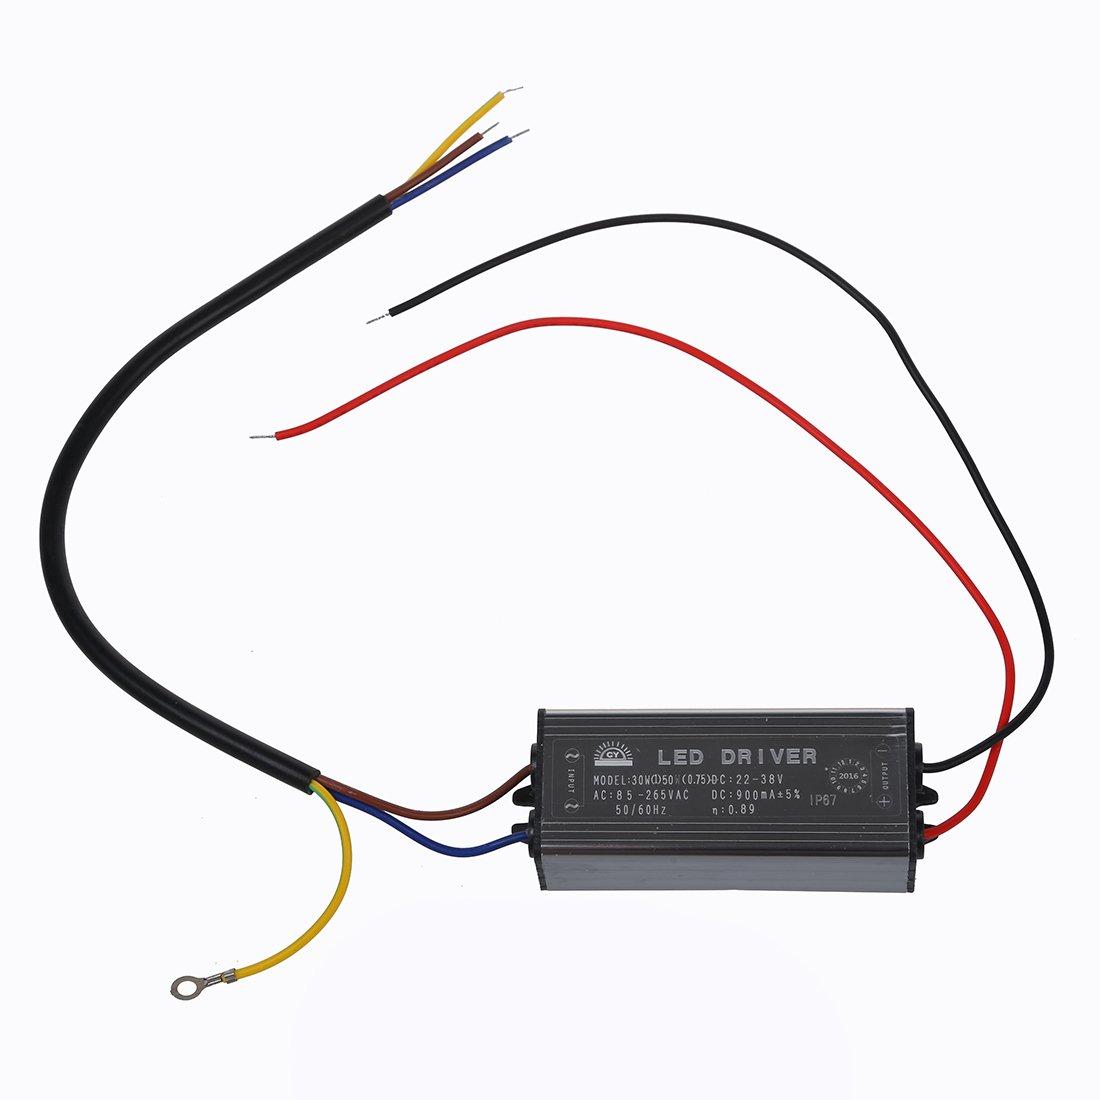 SODIAL(R) LED Alimentatore Driver Corrente Costante DC30-36V 900mA 30W Impermeabile IP6 020669